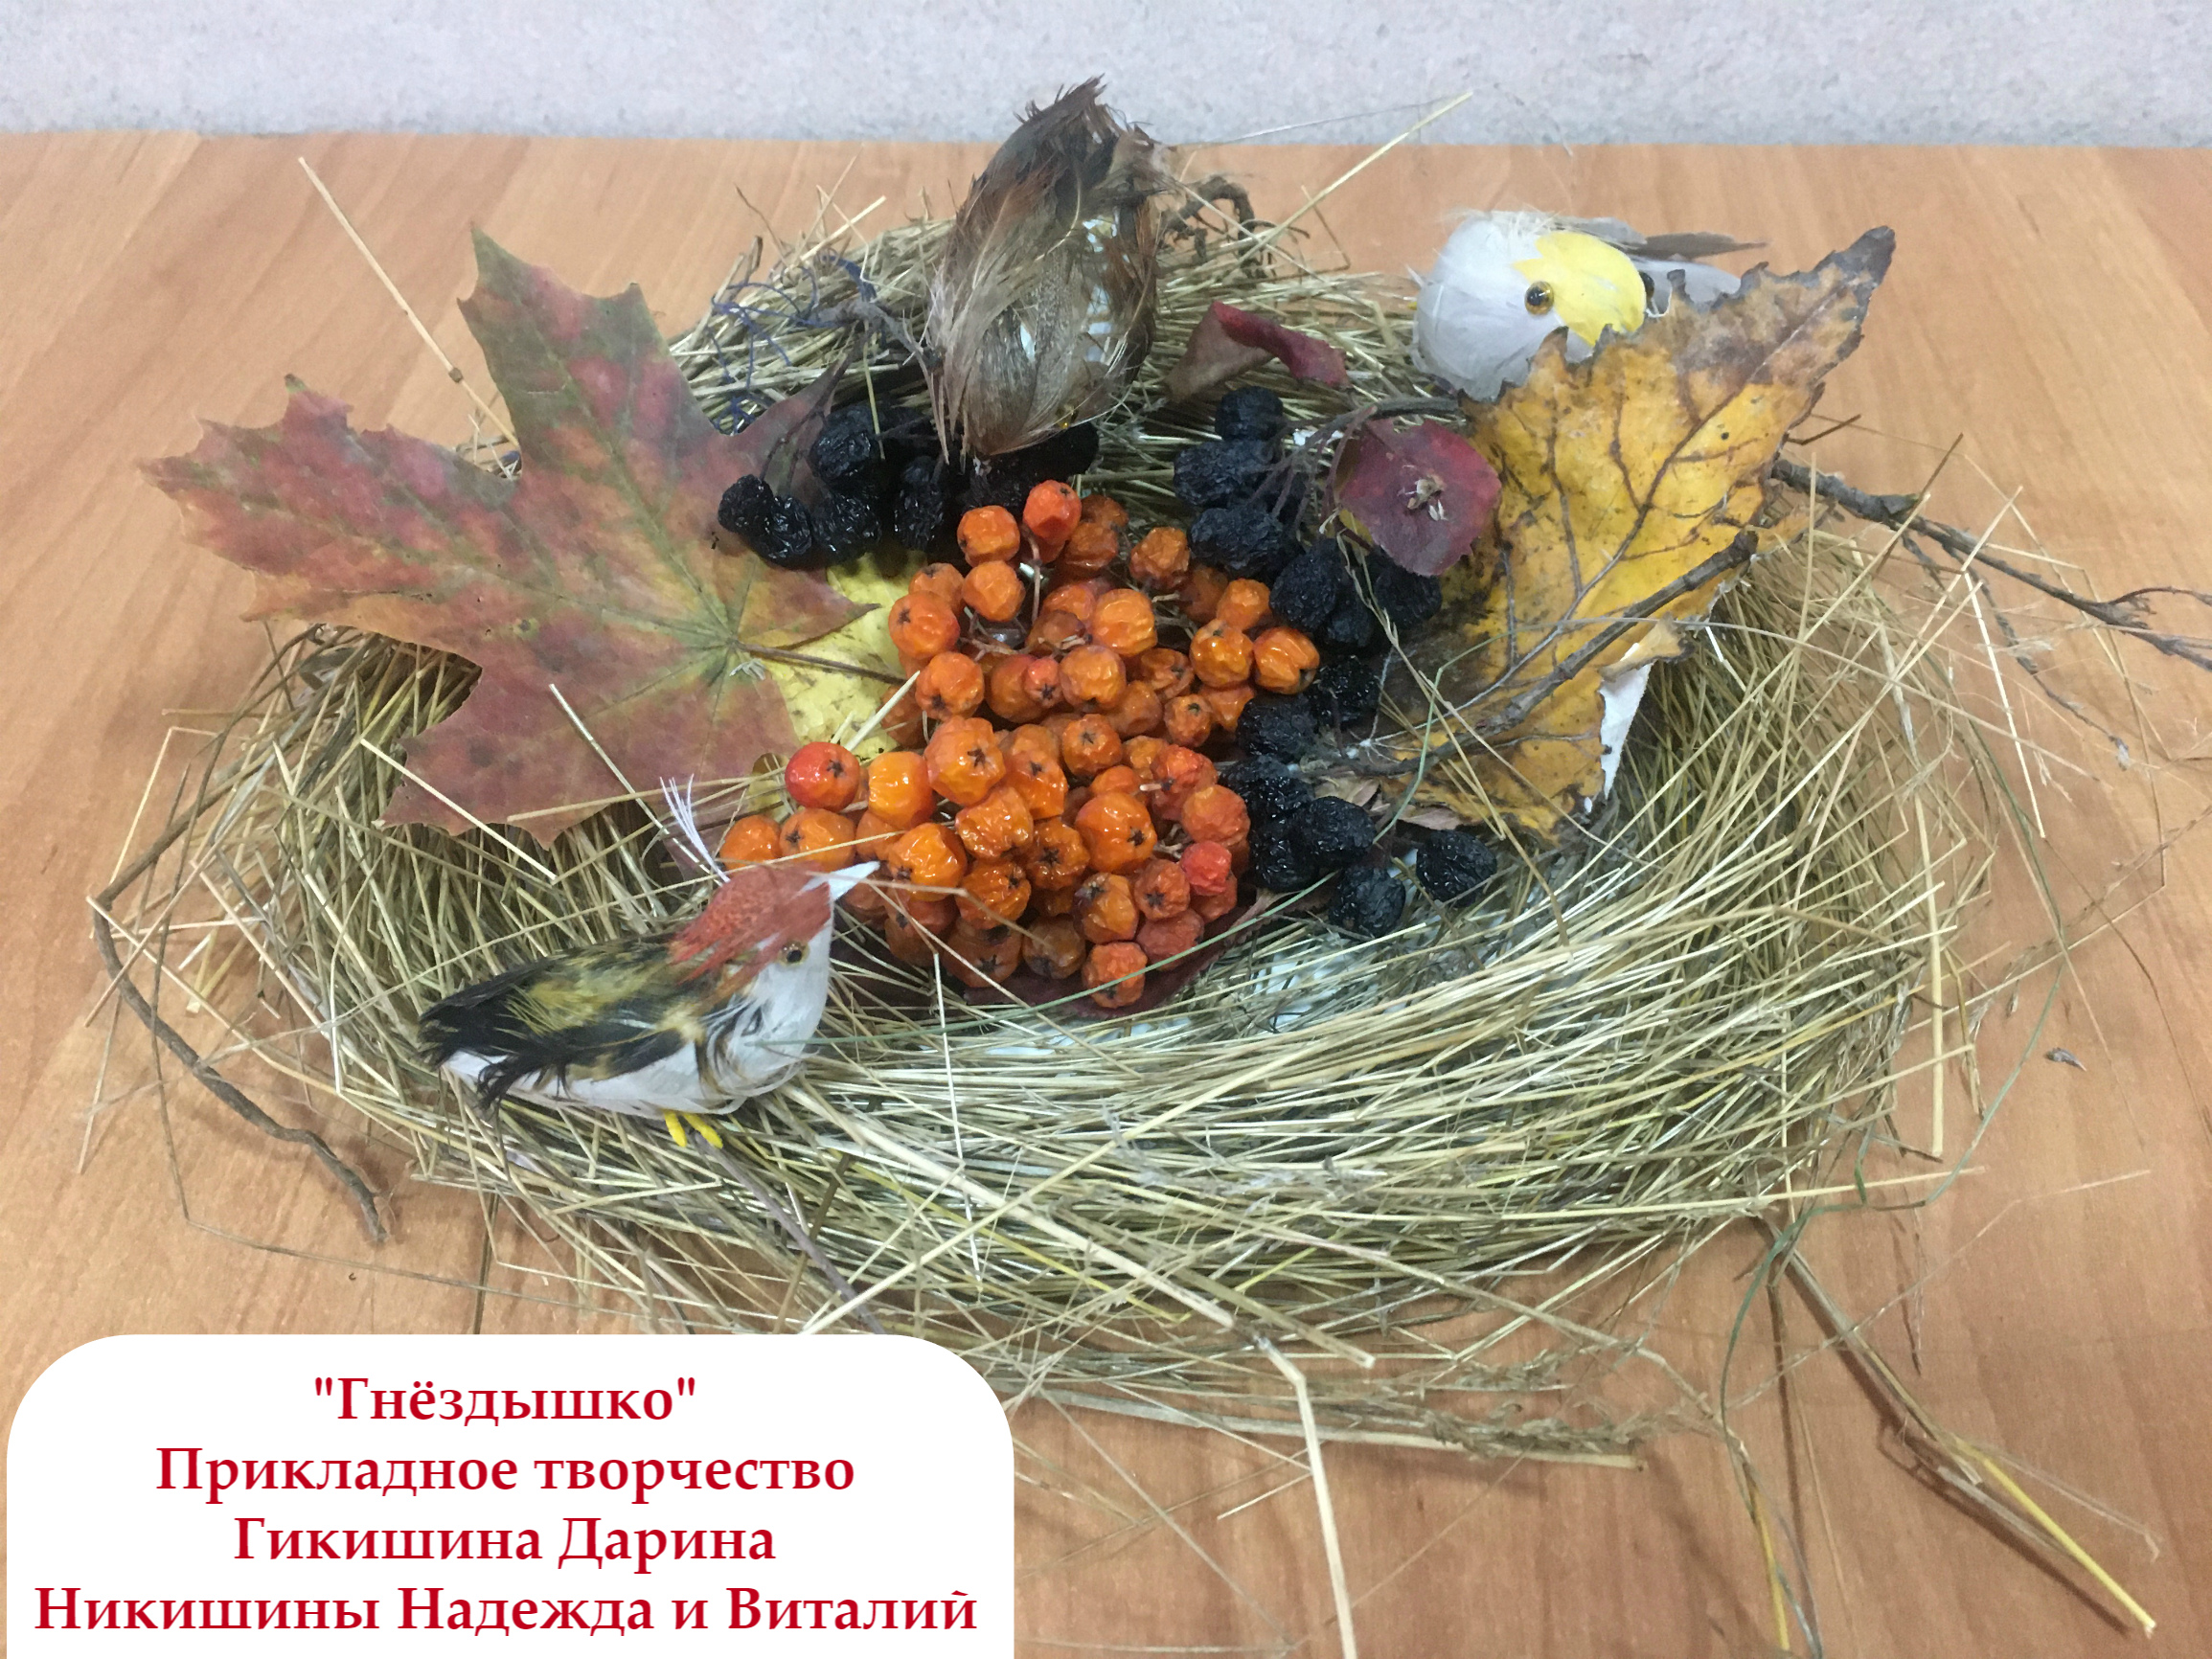 Nikishiny